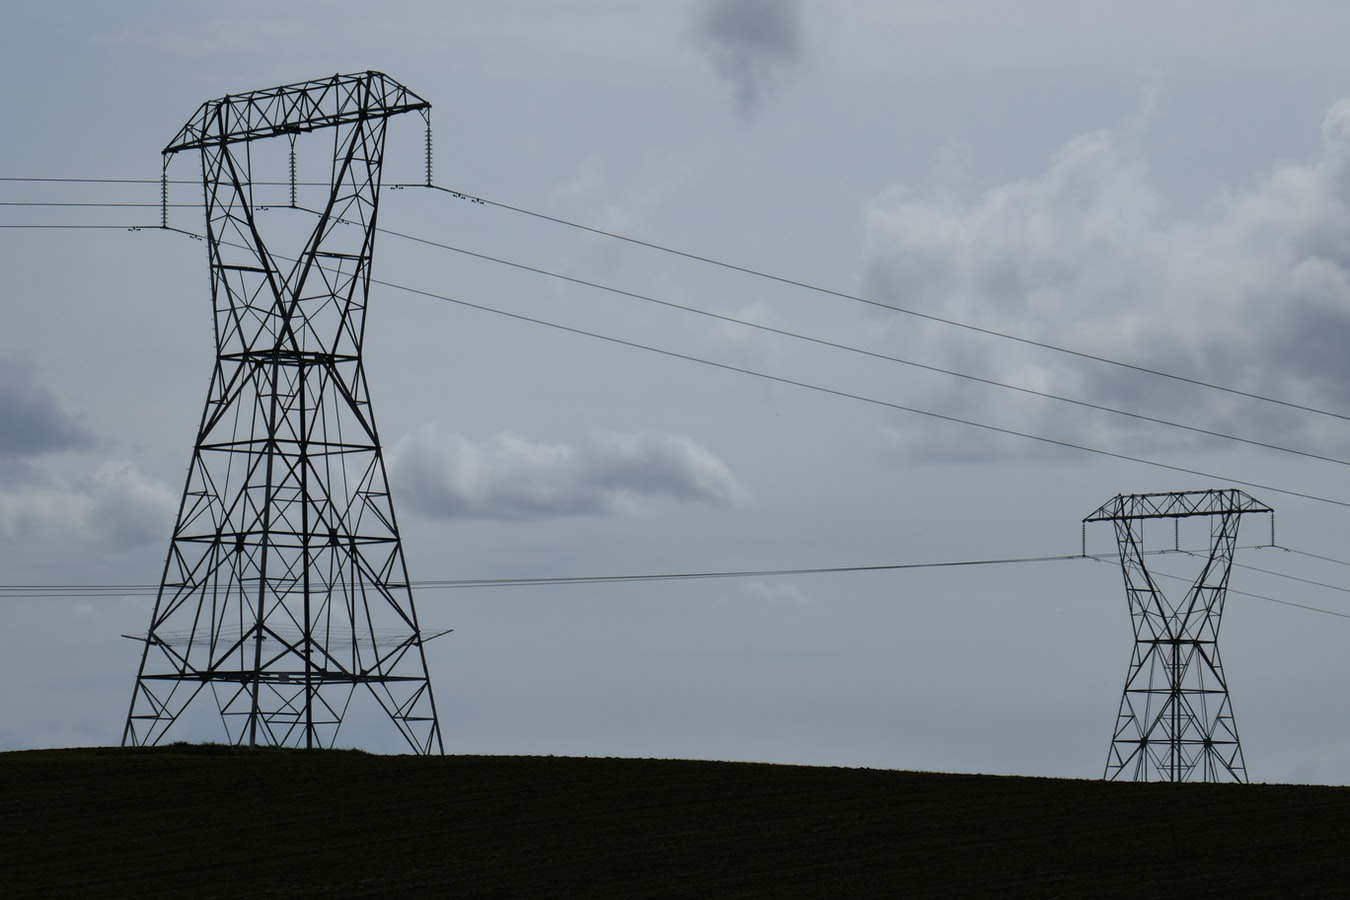 Jan Kaluza - power lines